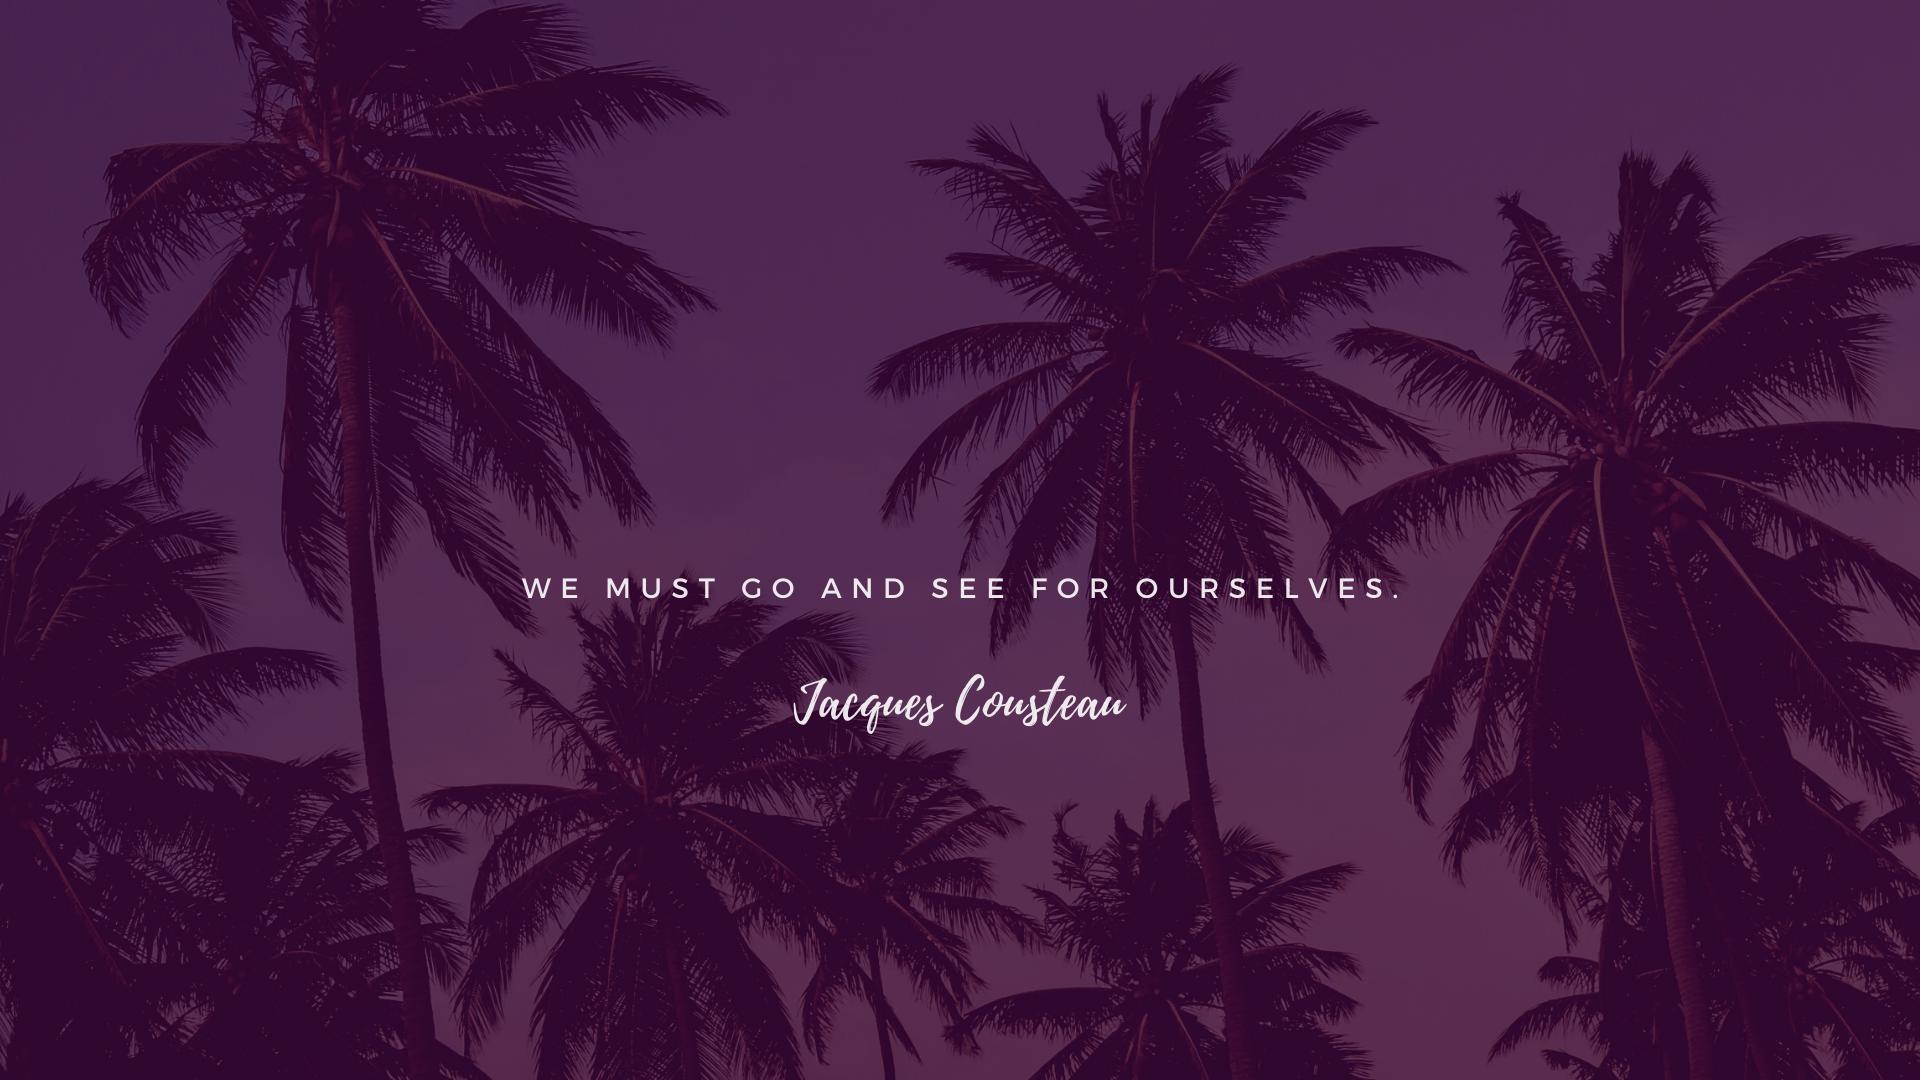 Quotes Desktop Wallpapers Motivational Quotes Motivational Quotes Wallpaper Quote Backgrounds